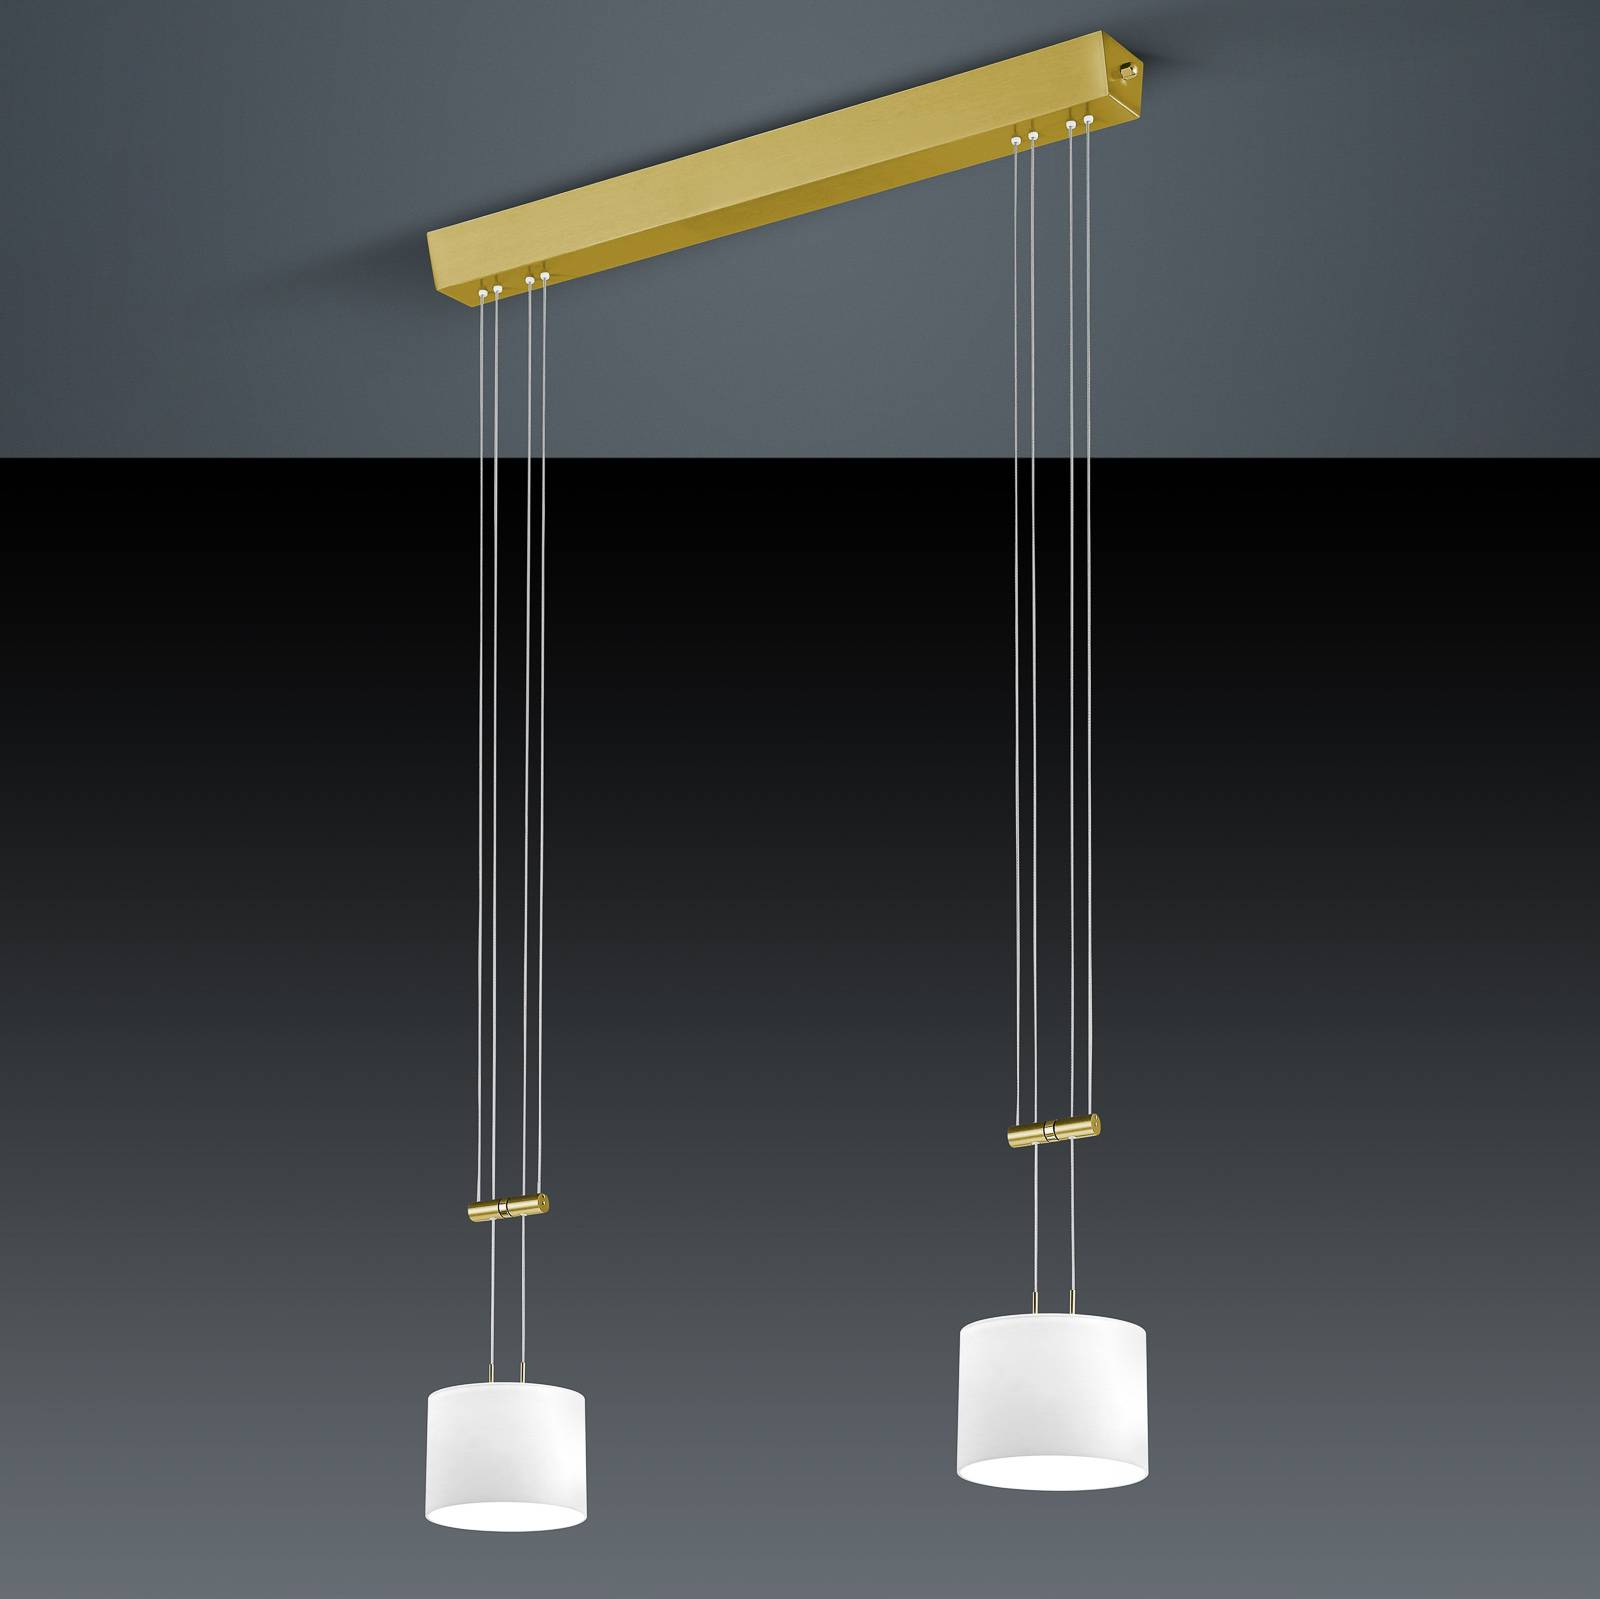 BANKAMP Grazia riippuvalaisin 2-lamp messinki